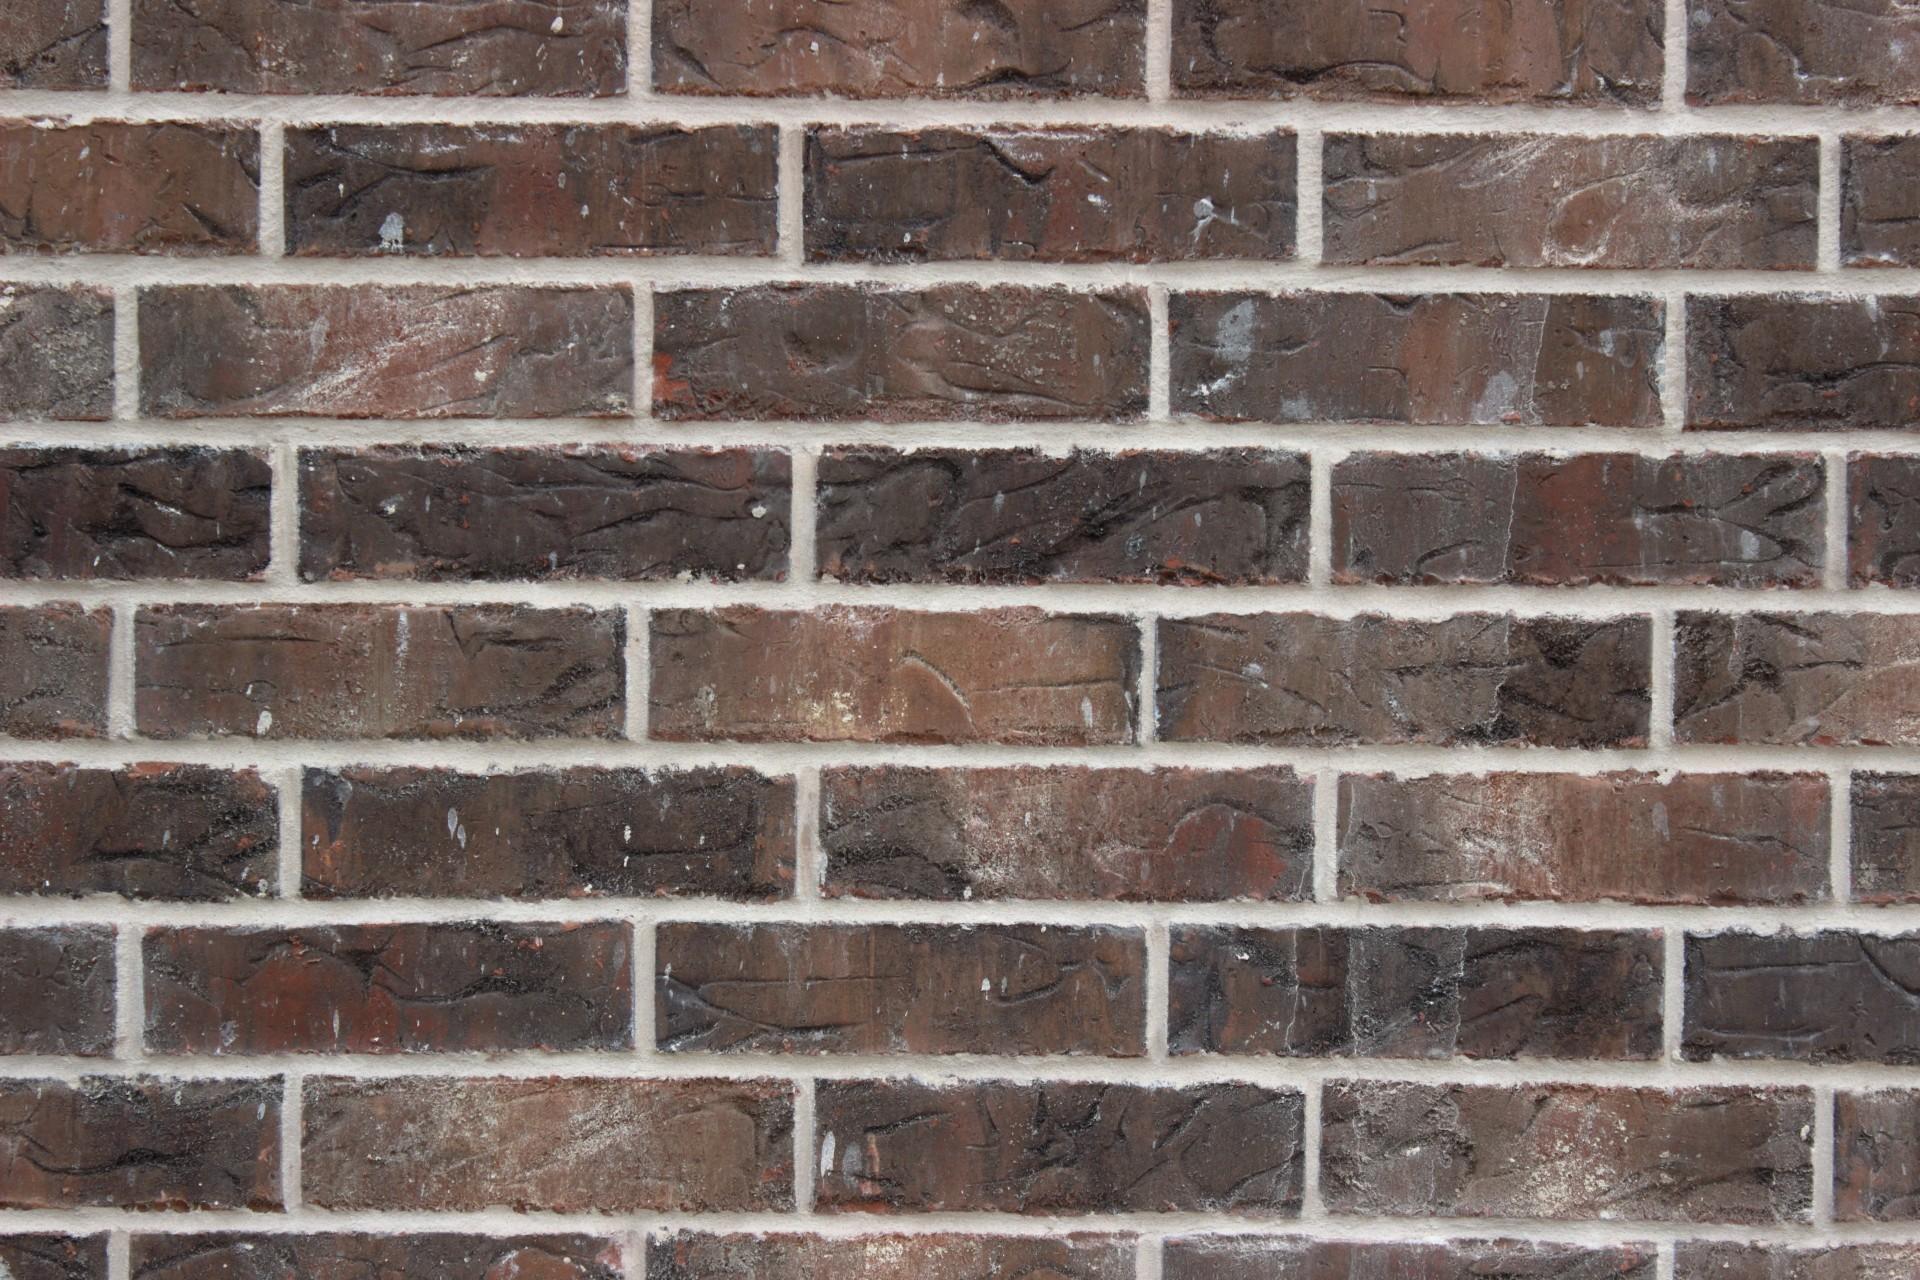 Culberson Brick